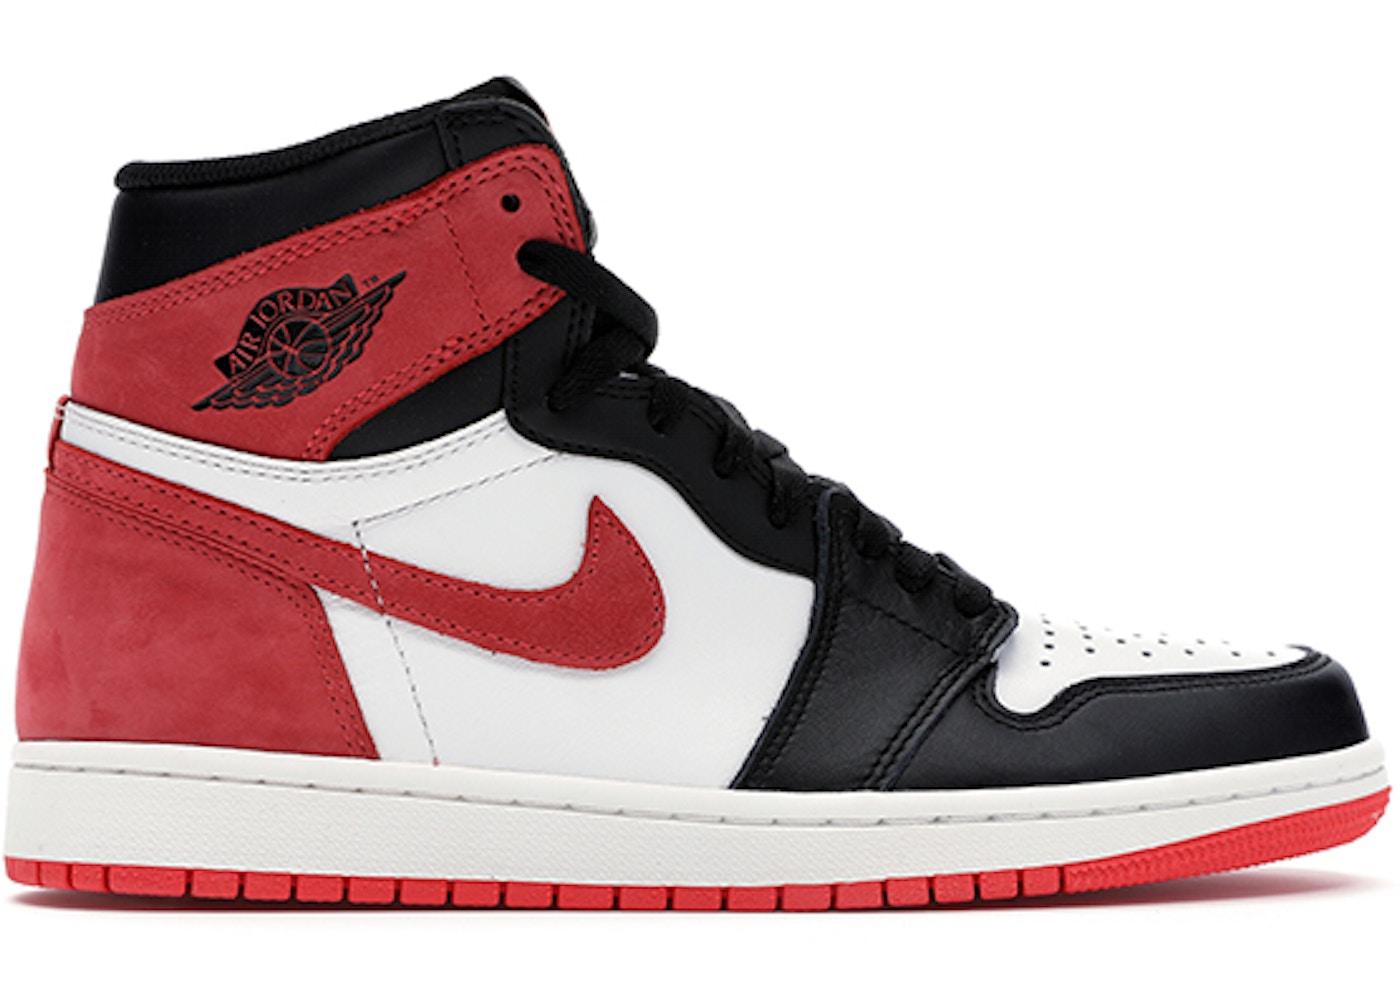 best loved f72f0 03982 Jordan 1 Retro High Track Red